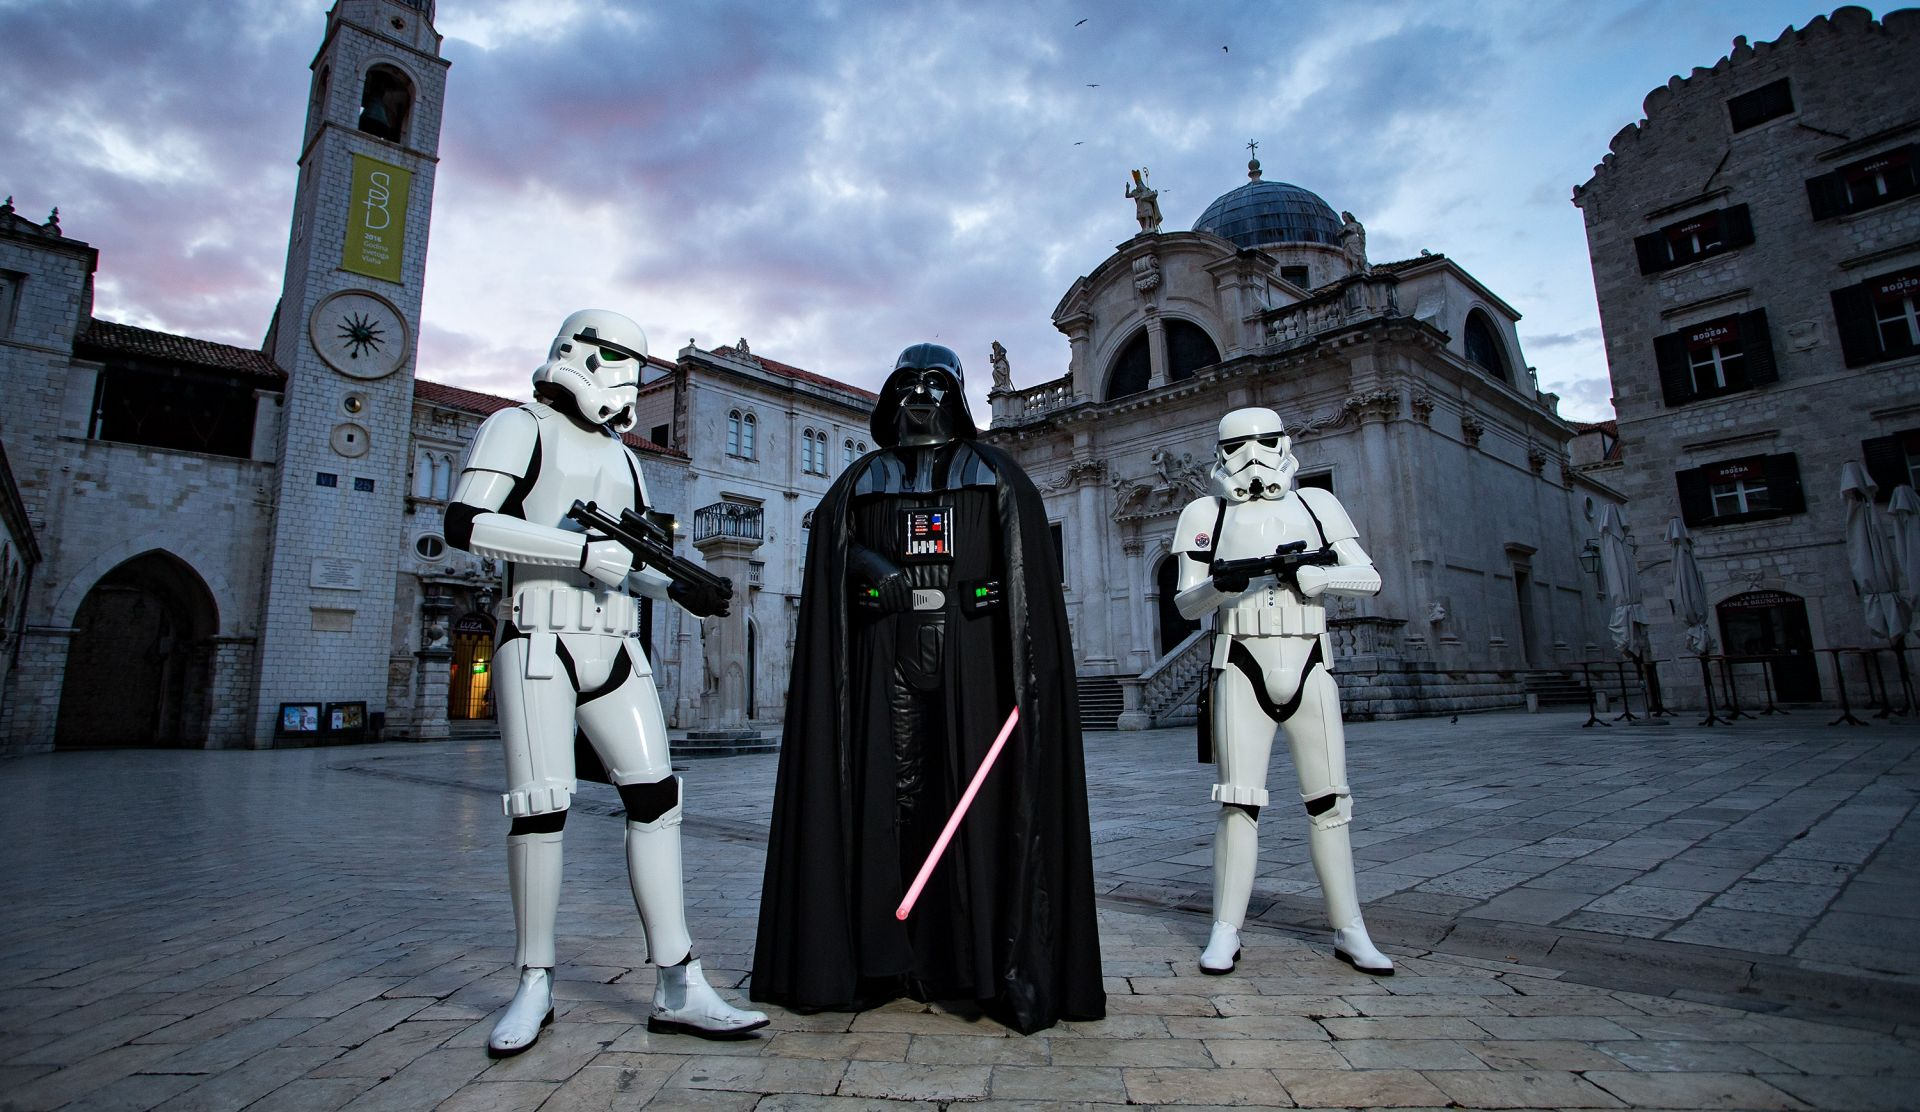 FOTO: DUBROVNIK Darth Vader i Stormtrooperi prošetali Gradom